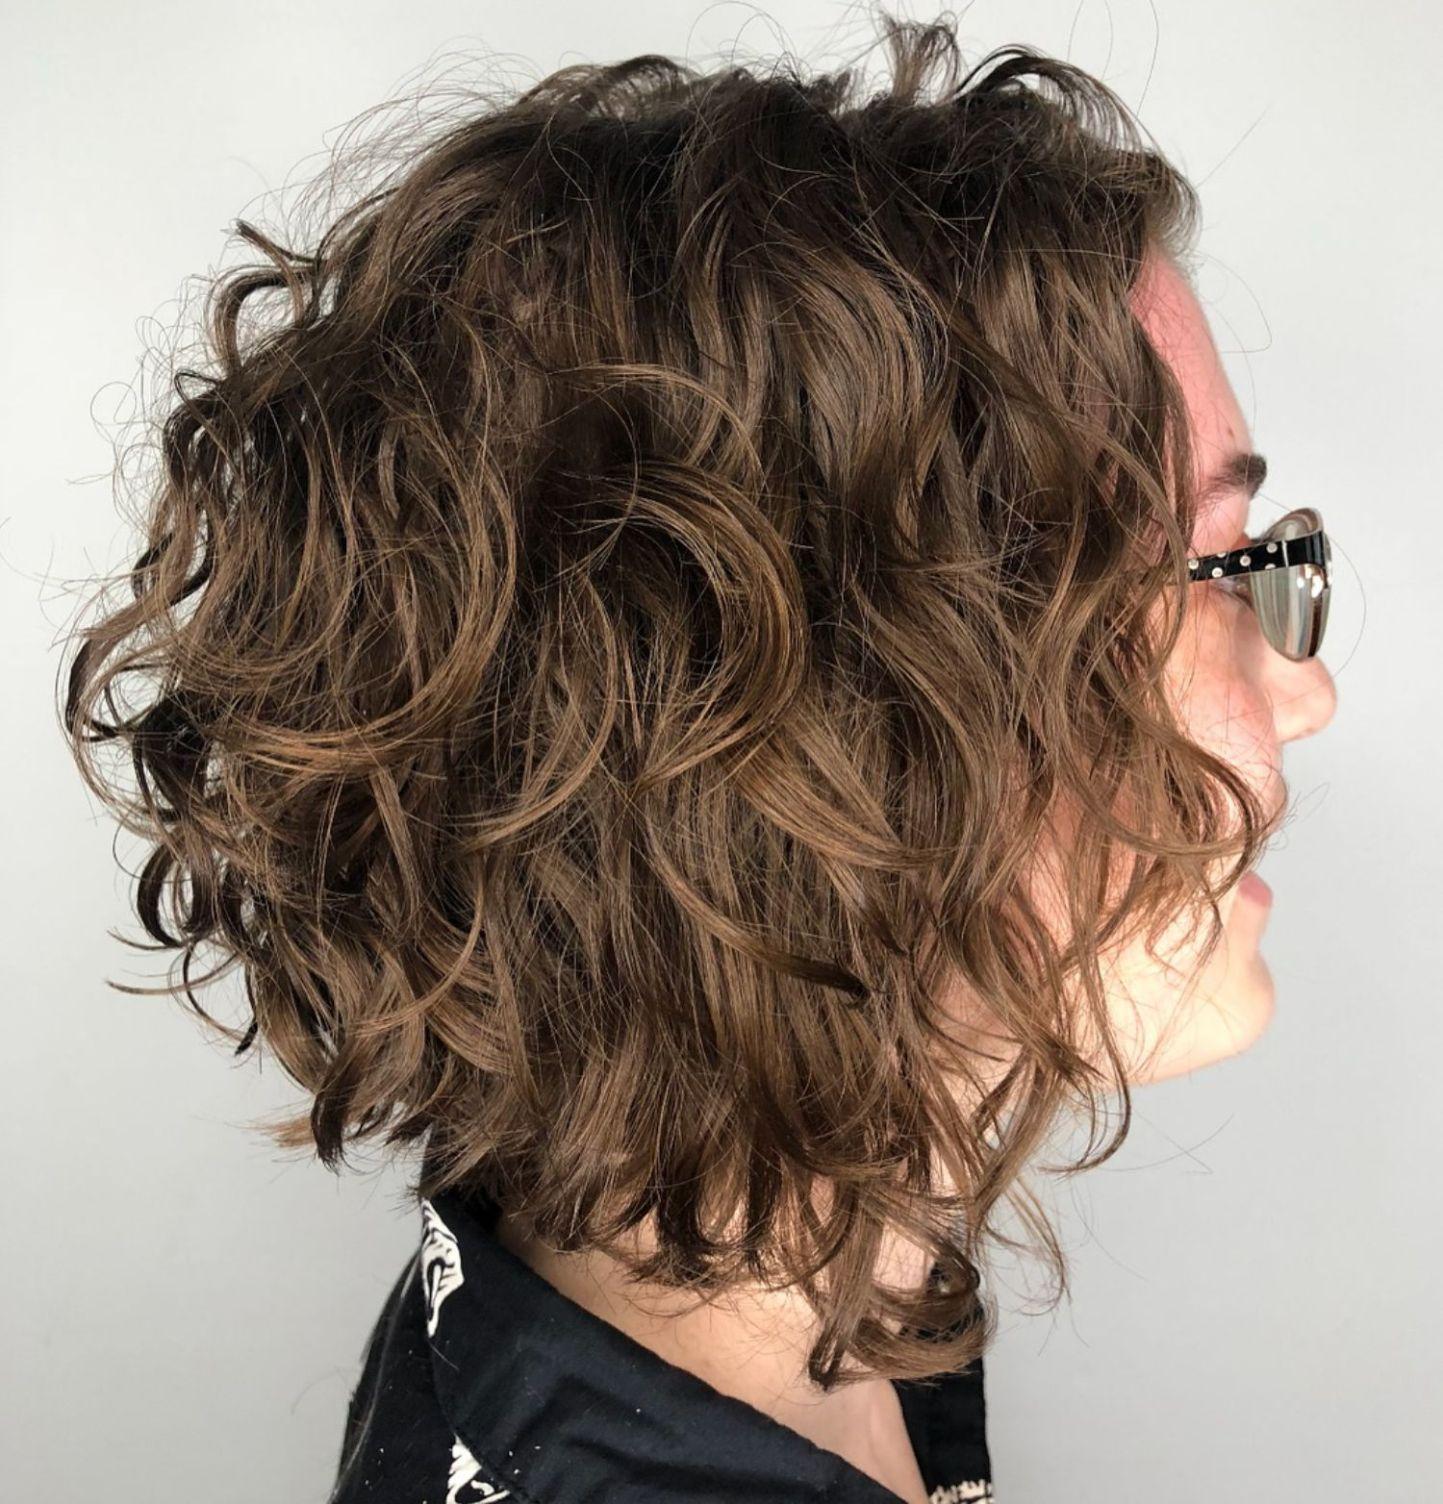 Pin On Bob Cut Hairstyles